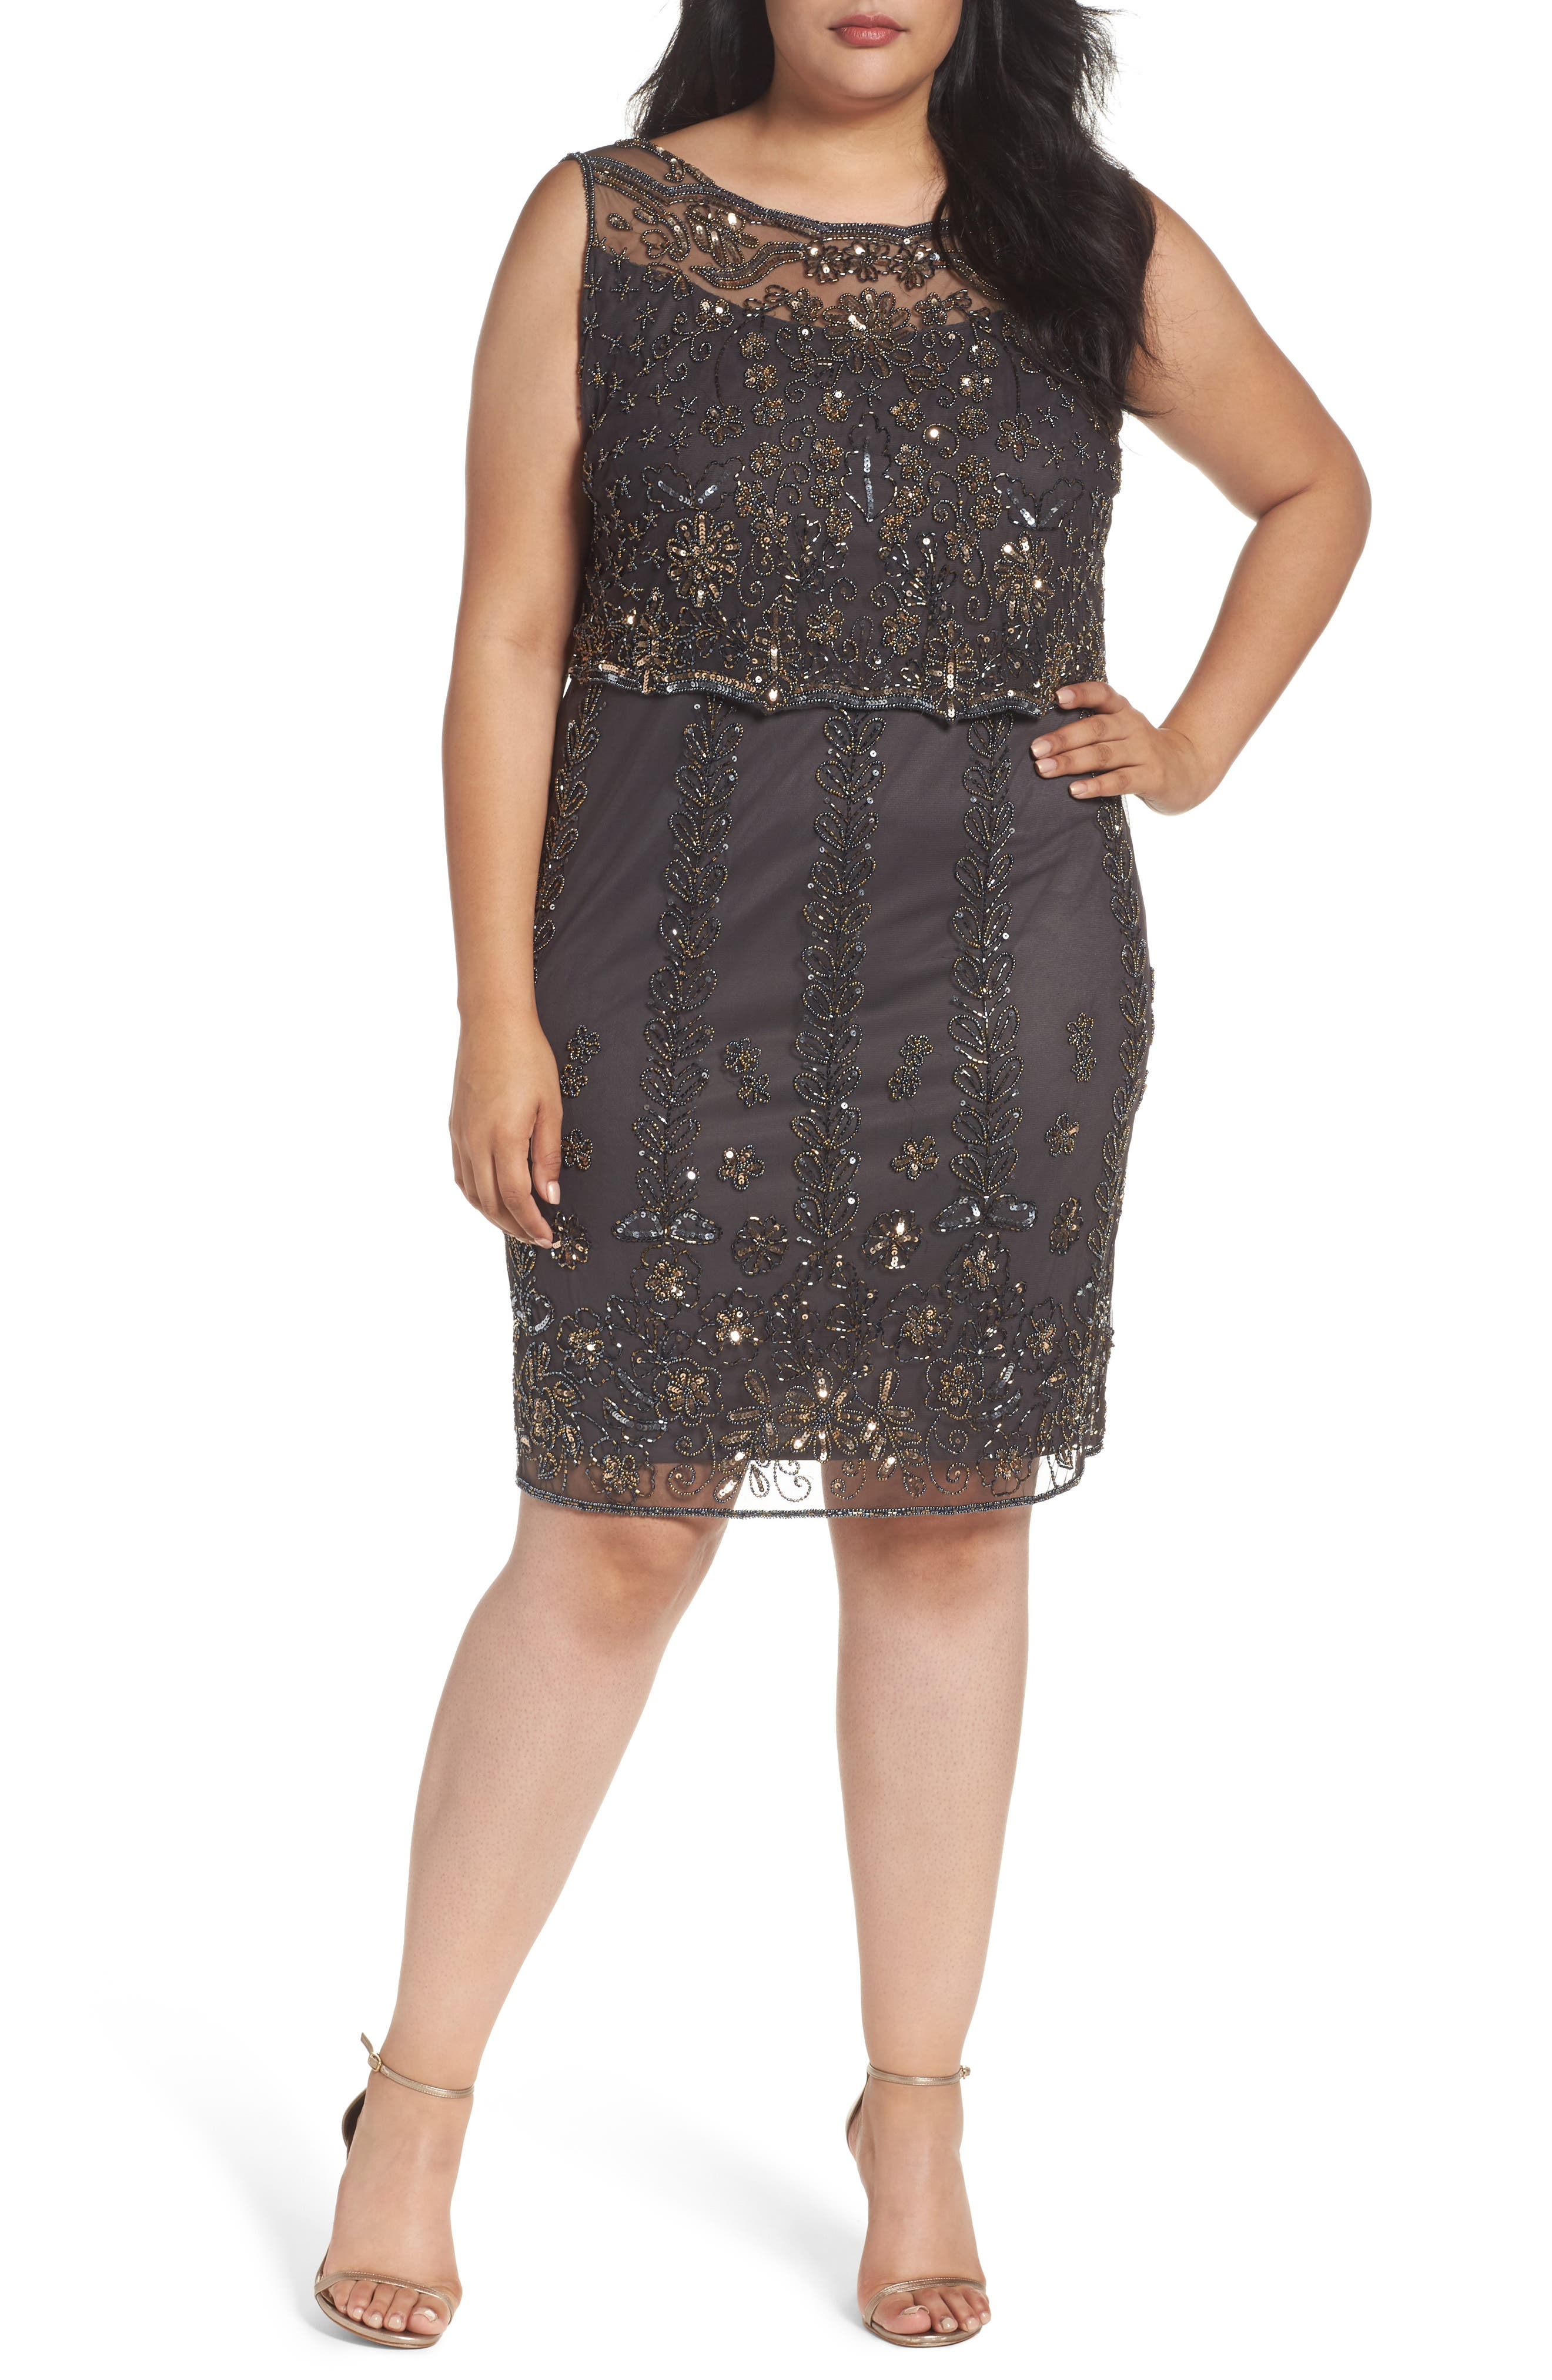 Alternate Image 1 Selected - Pisarro Nights Embellished Popover Bodice Sheath Dress (Plus Size)